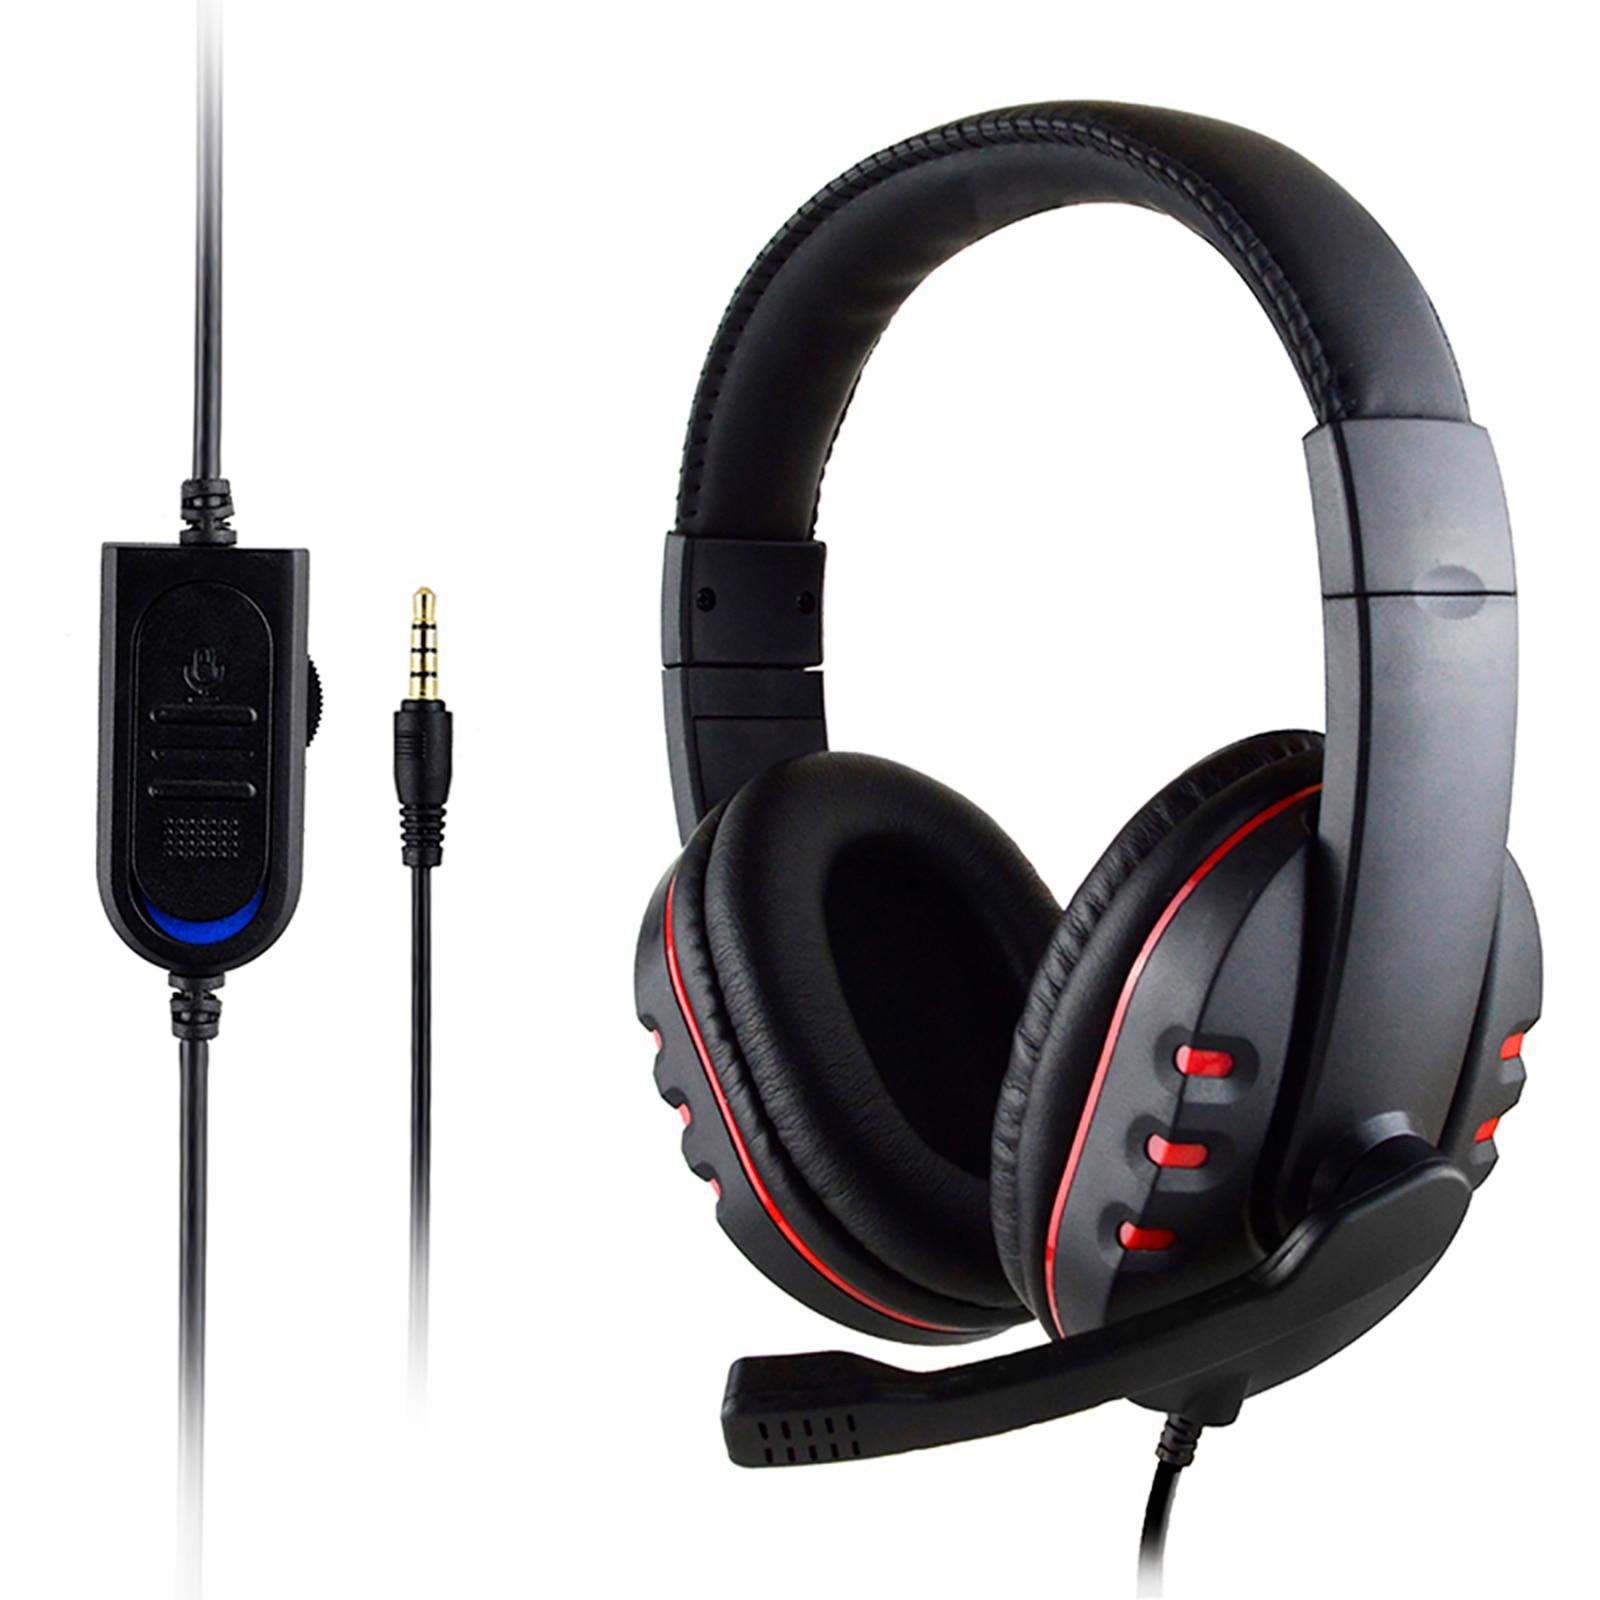 SOONHUA 3 5mm Wired Gaming Headset Deep Bass Game Earphone Computer Headset Gamer Headphones With HD Microphone